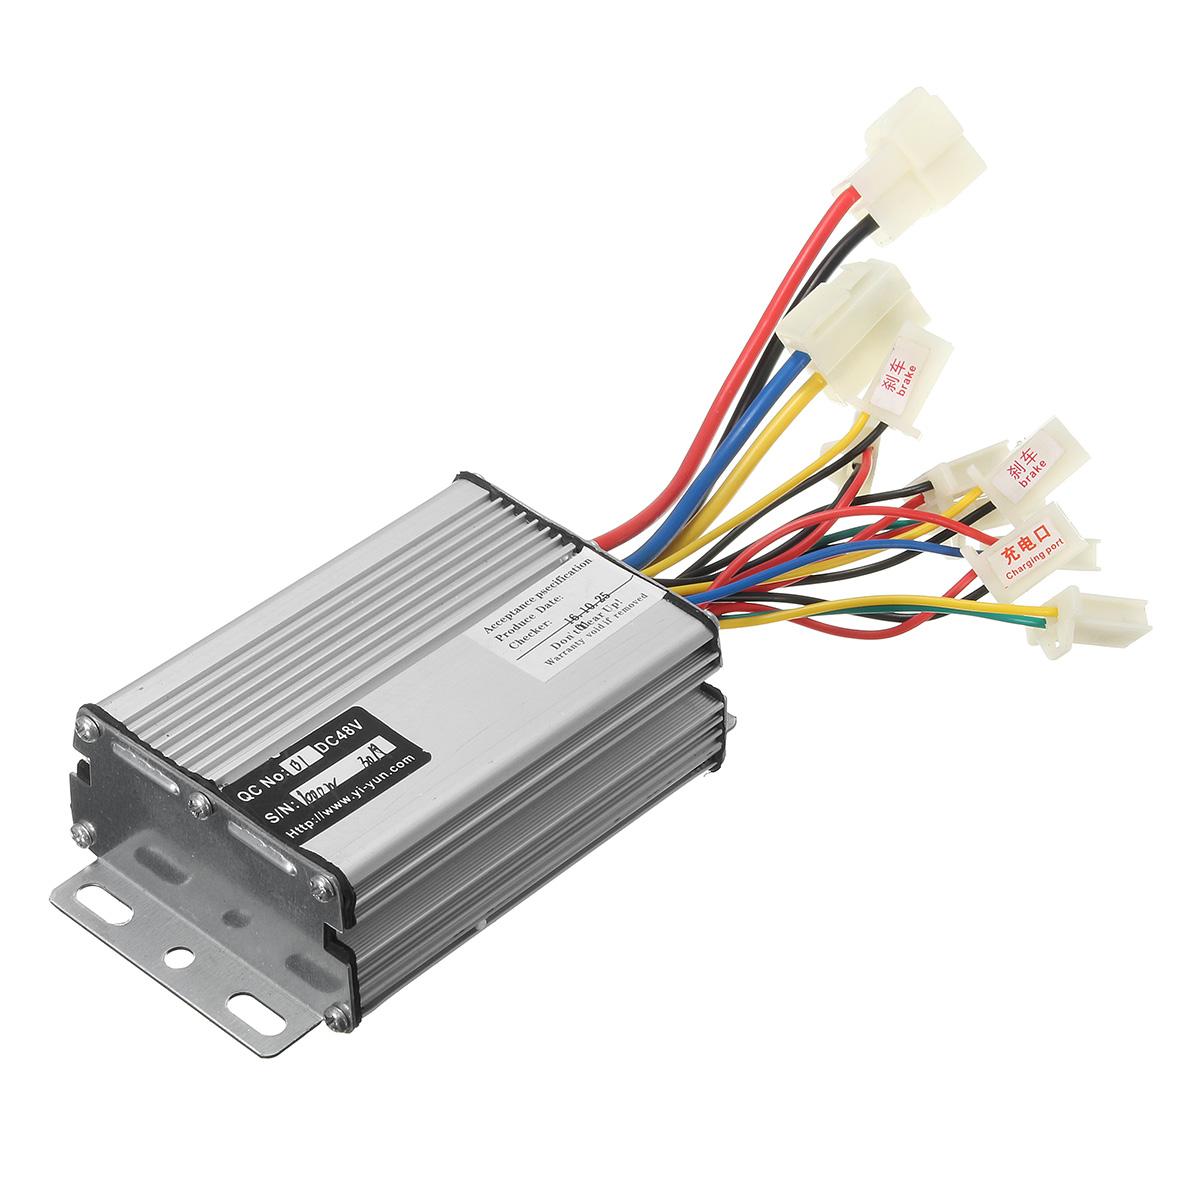 48v1000w electric vehicle motor brush controller scooter for Dc motor controller for electric car